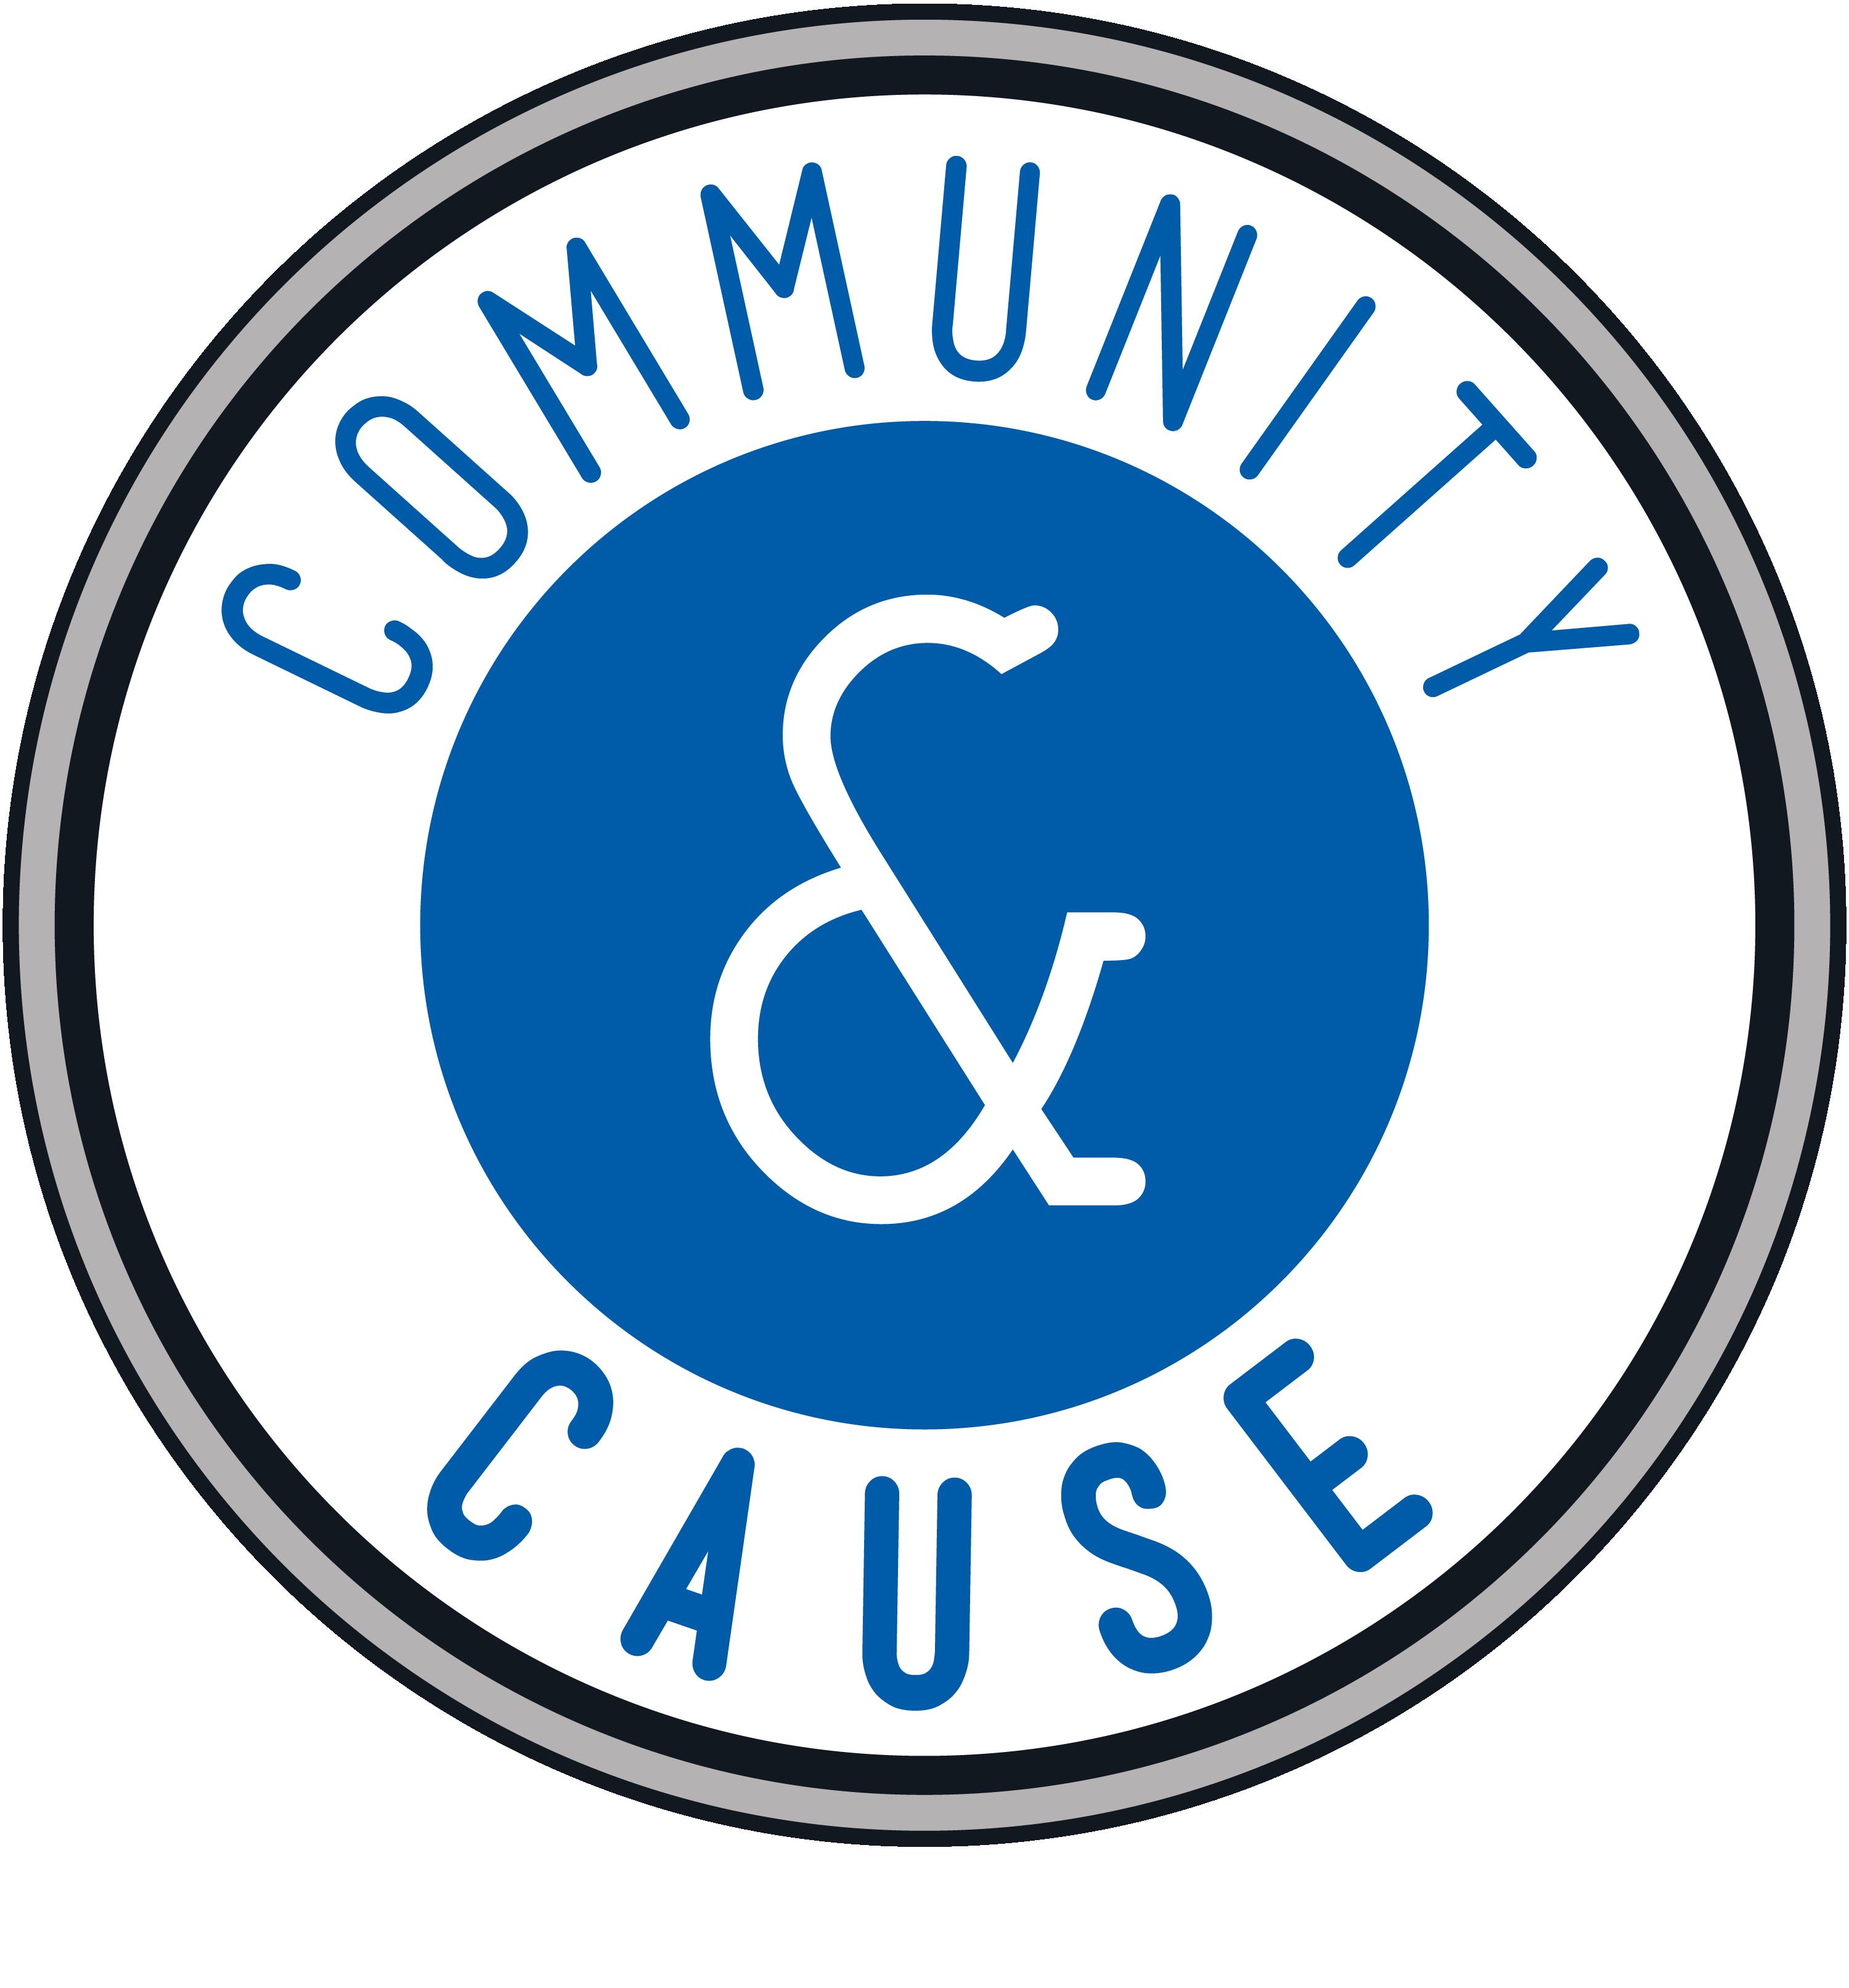 Community & Cause